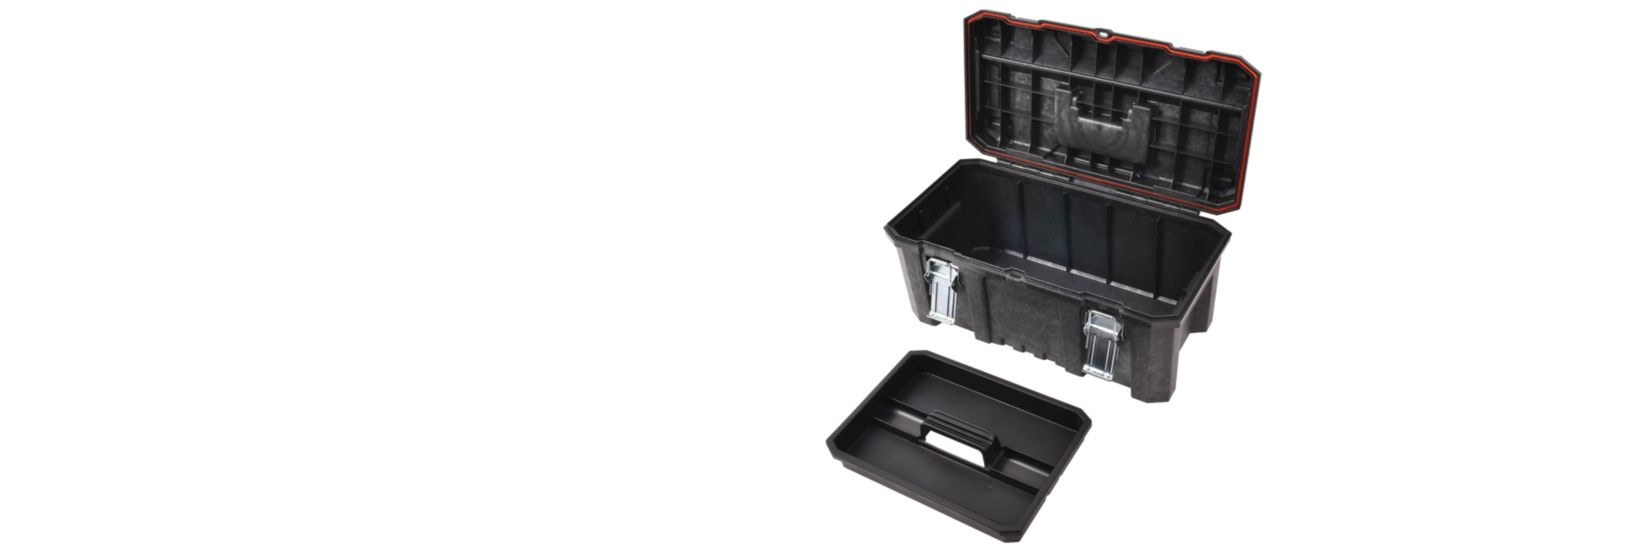 Tactix Heavy Duty Toolbox 21.5